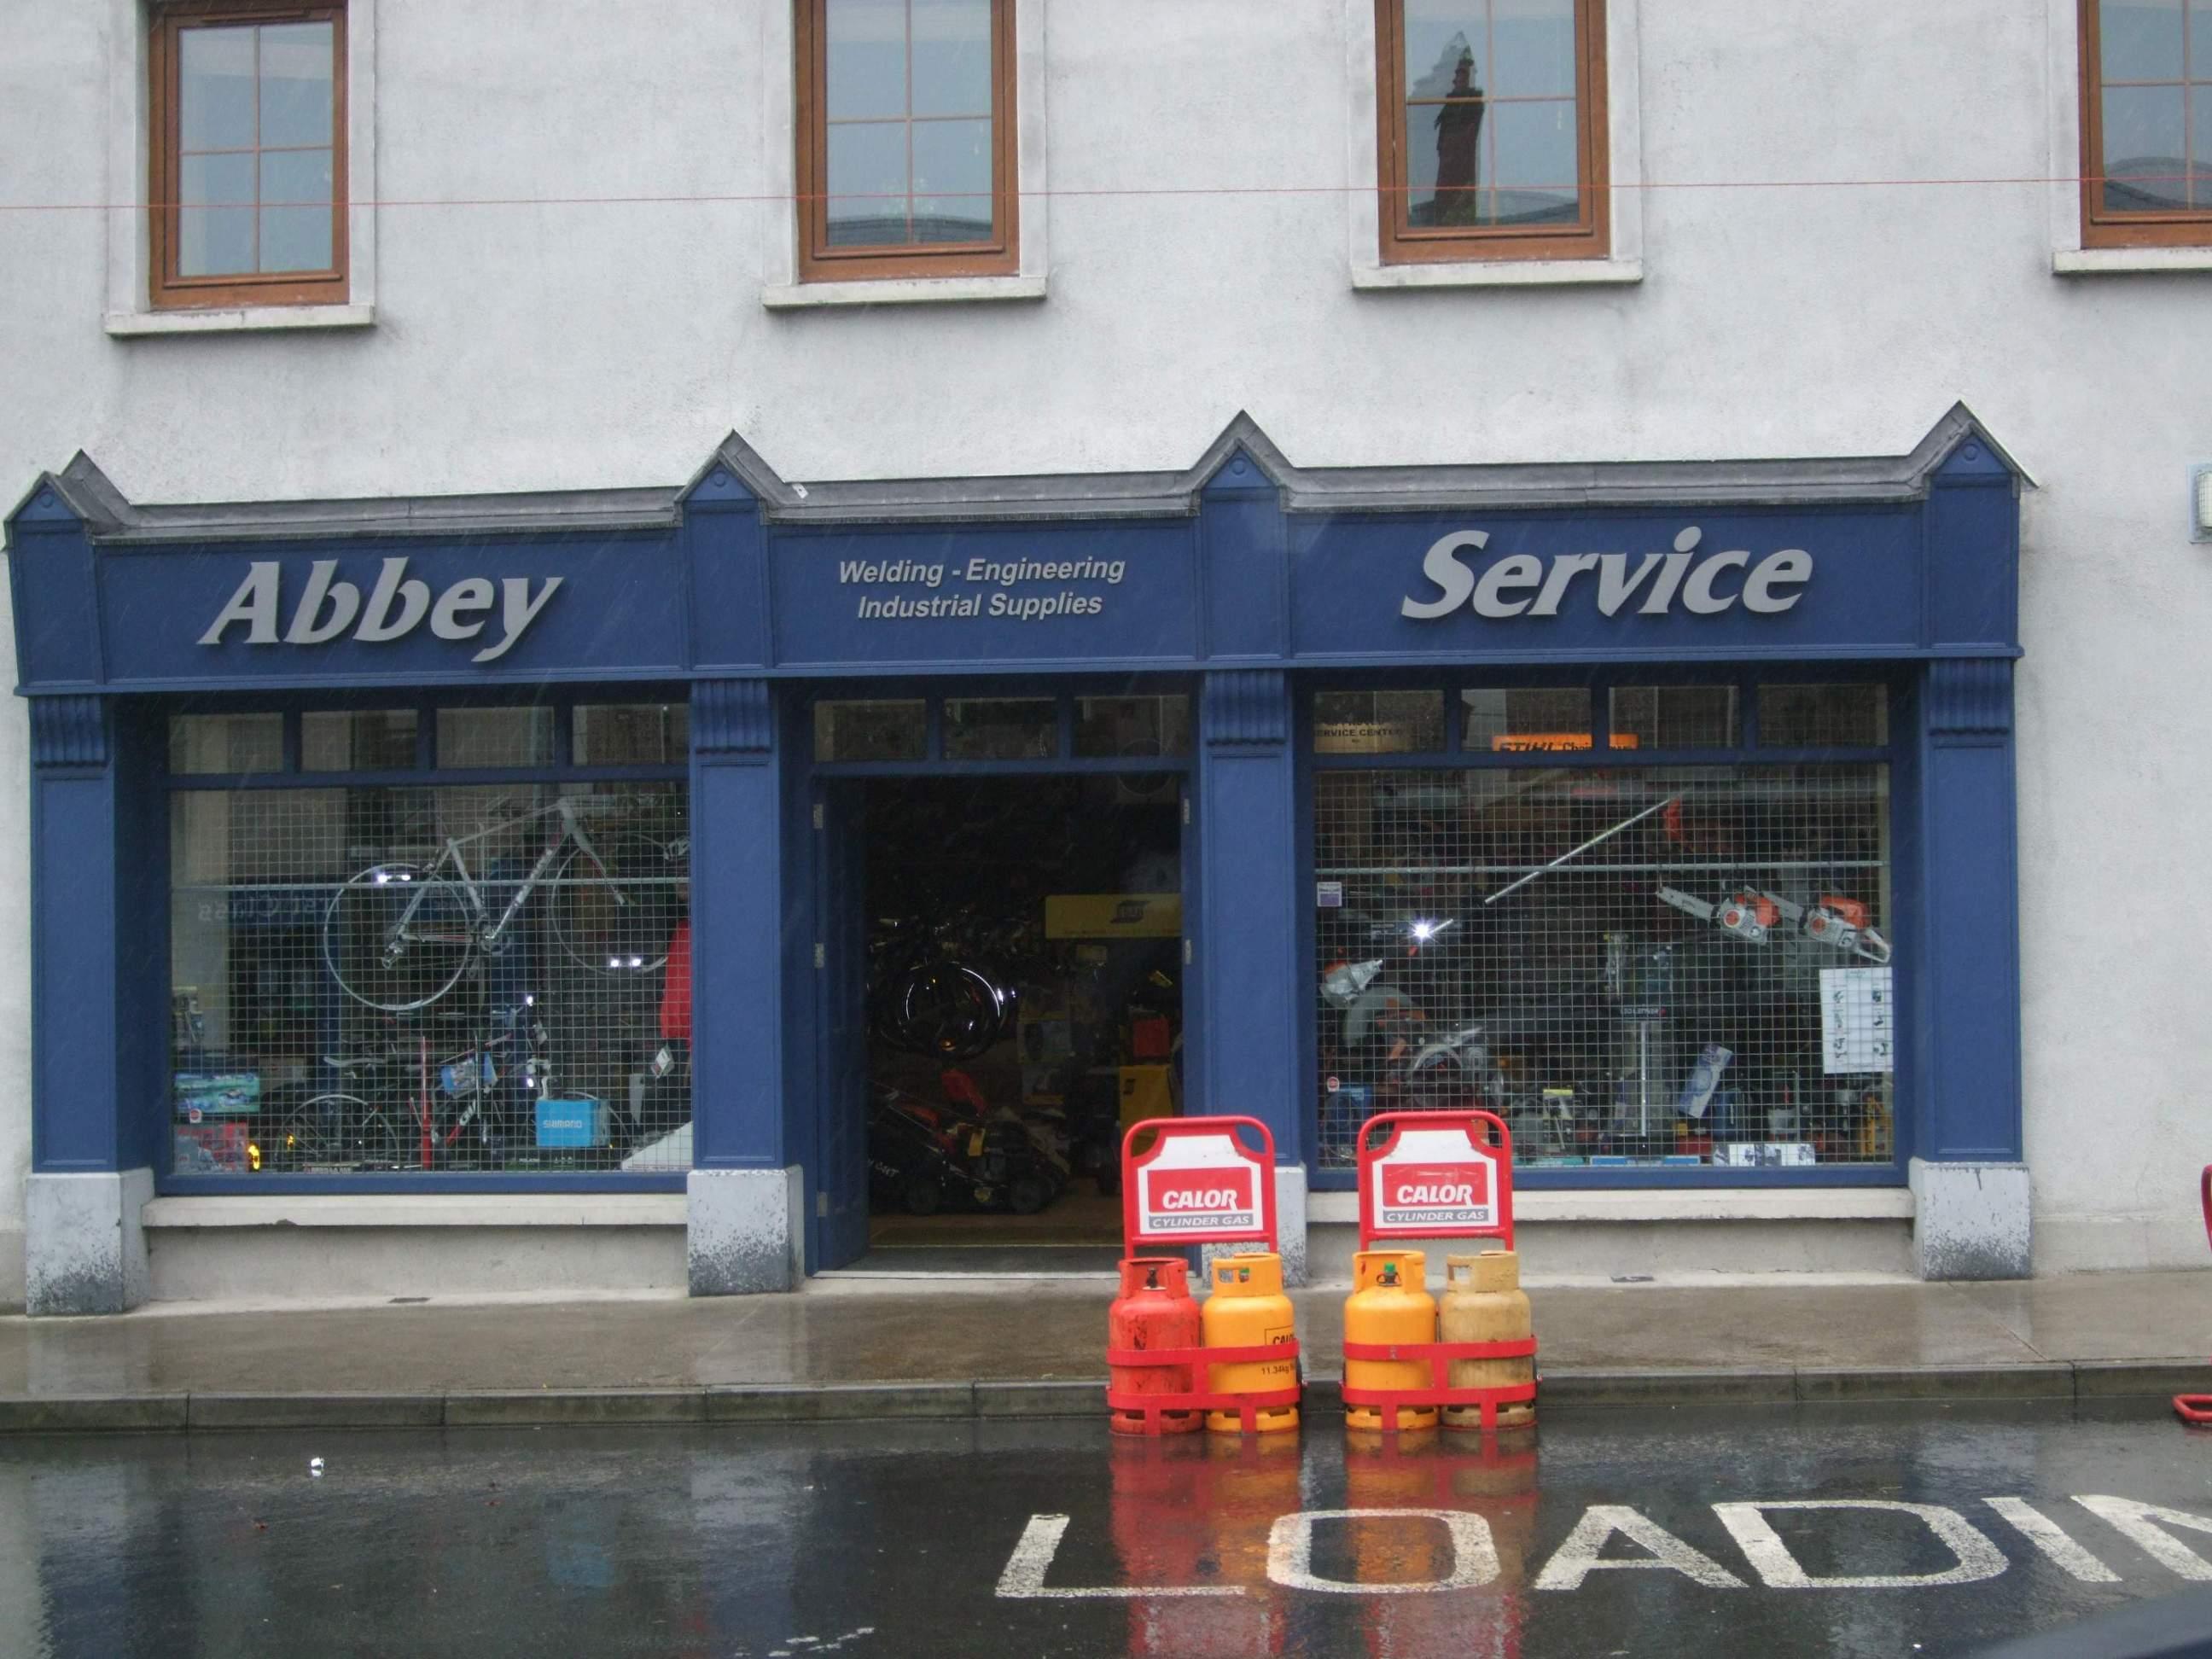 abbey service